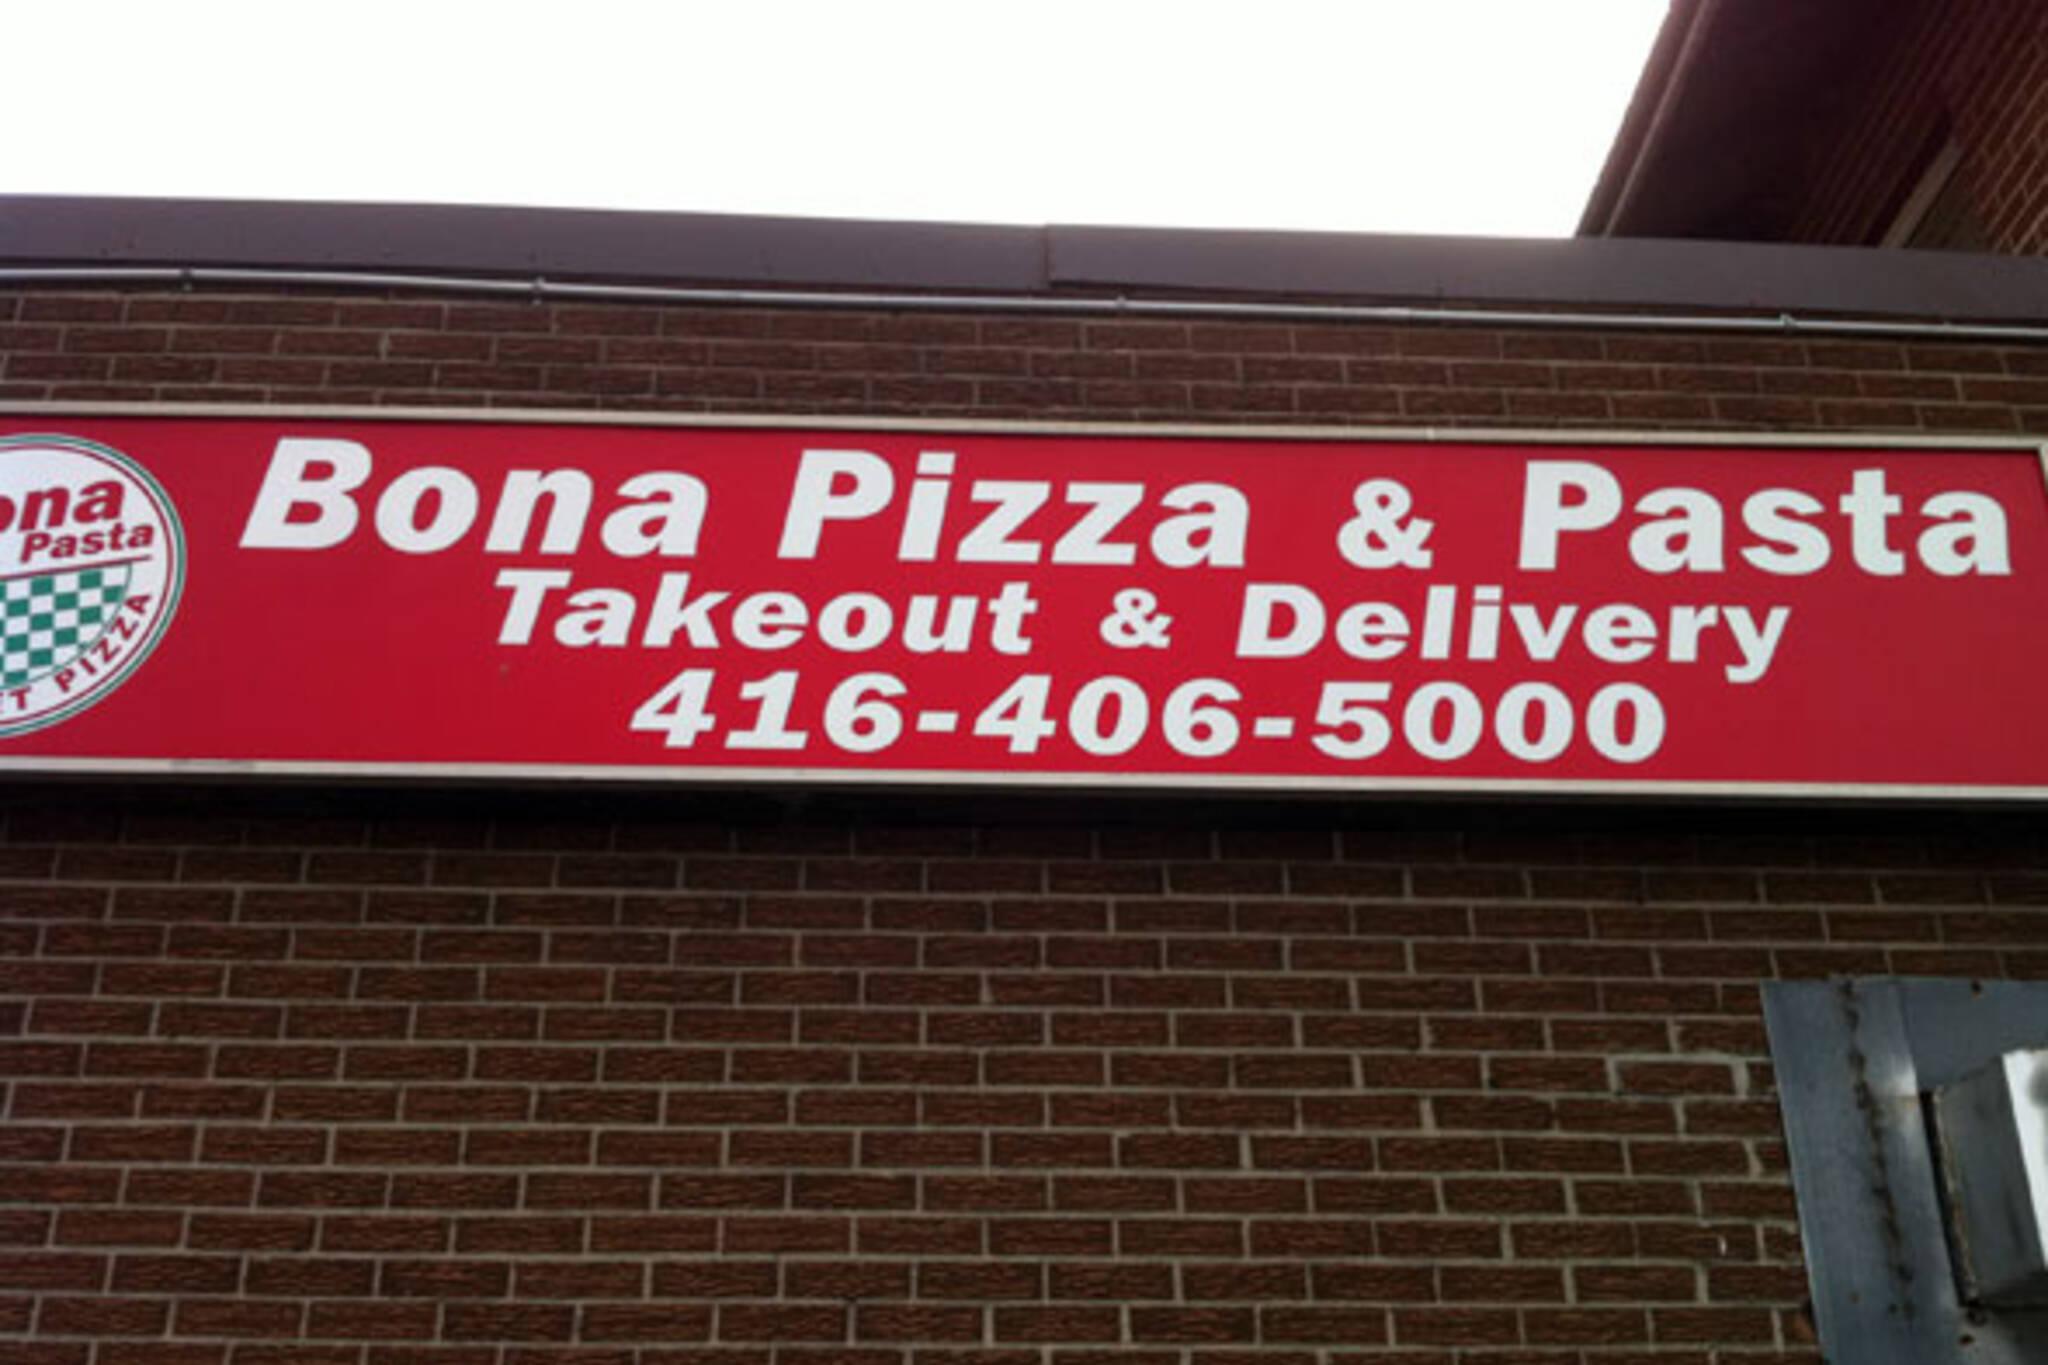 Bona Pizza and Pasta